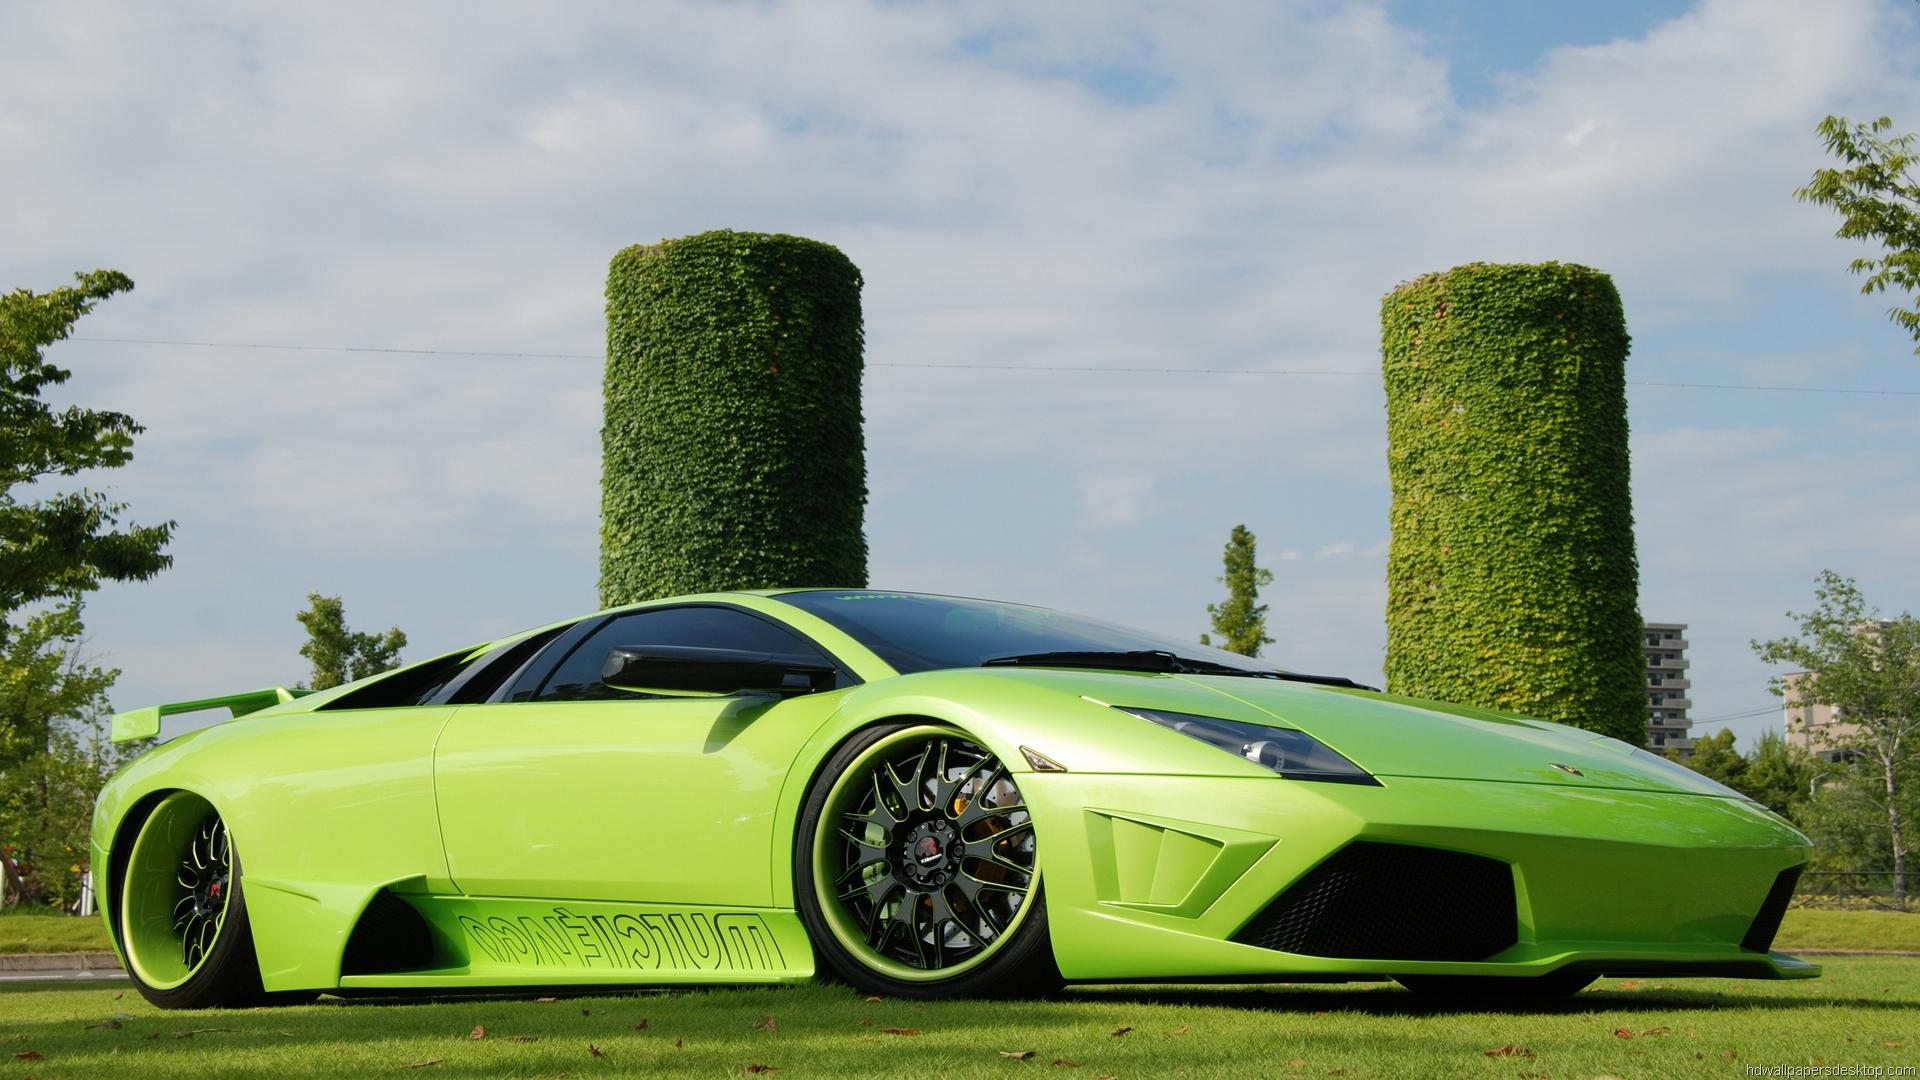 Lamborghini HD Wallpaper Full HD 1080p Cars Background Wallpapers HD 1920x1080